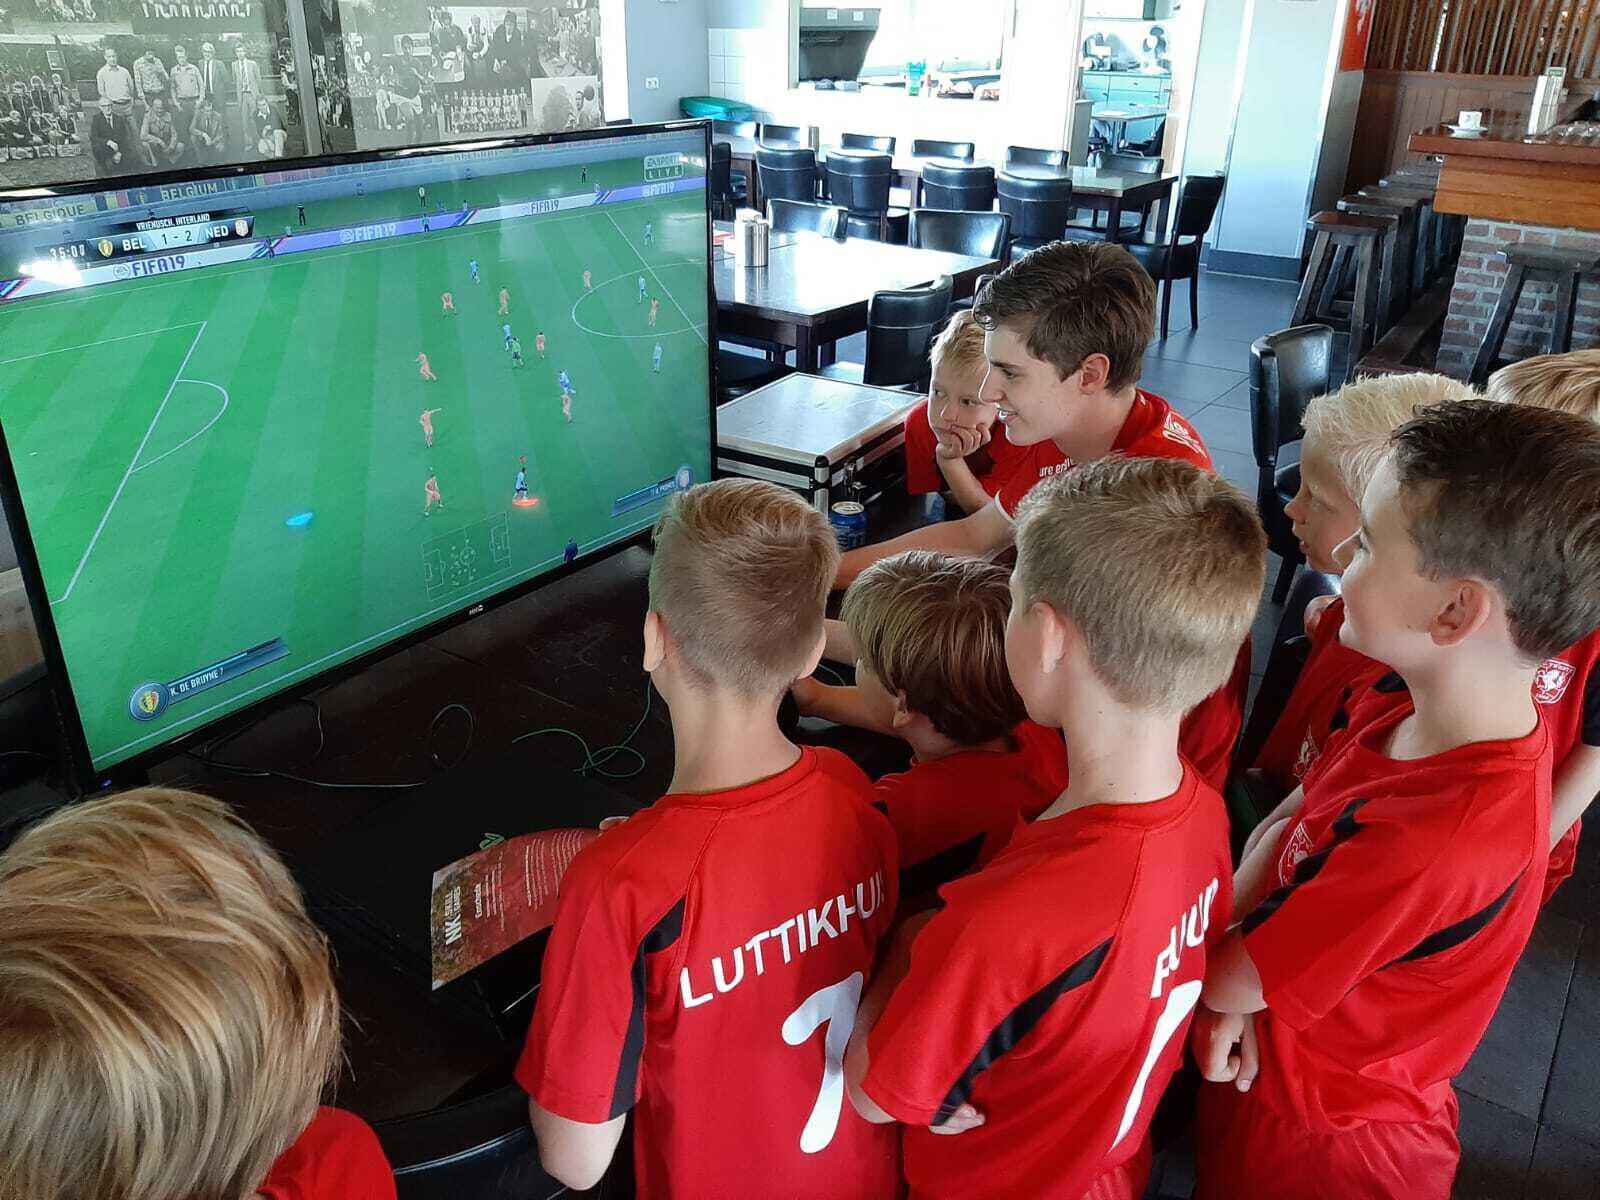 FIFA 20 toernooi i.s.m. FC Twente!